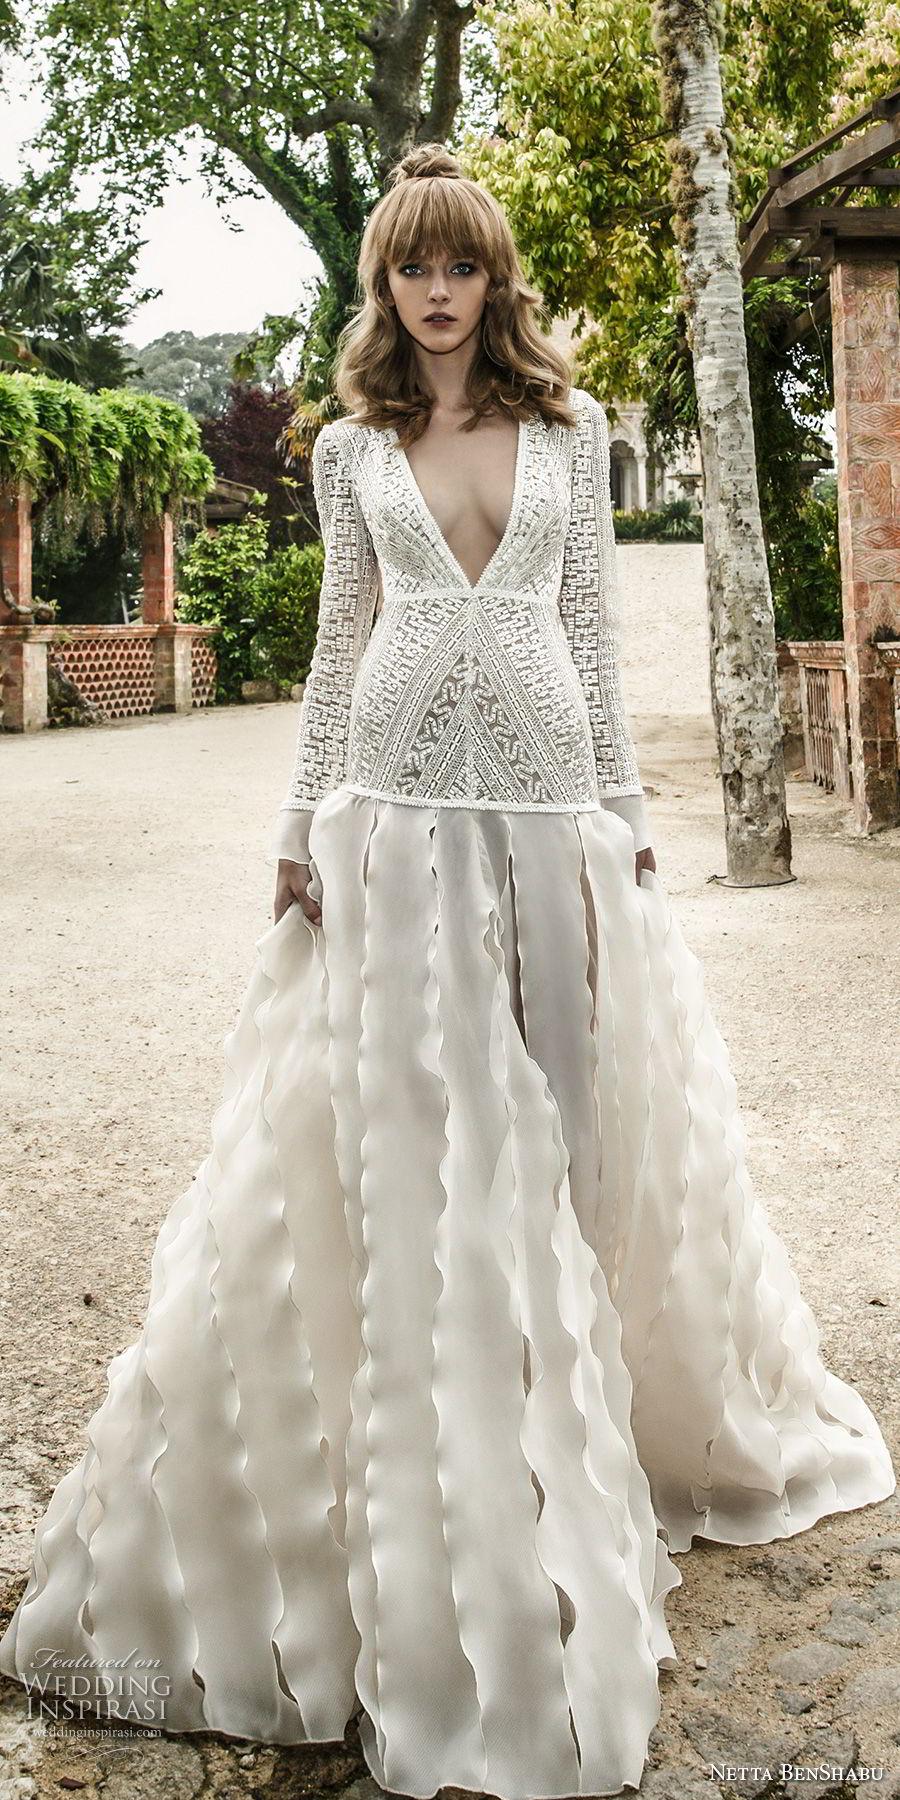 netta benshabu 2017 bridal long sleeves deep v neck heaving embellished bodice drop waist ruffled skirt keyhole back sweep train (12) mv